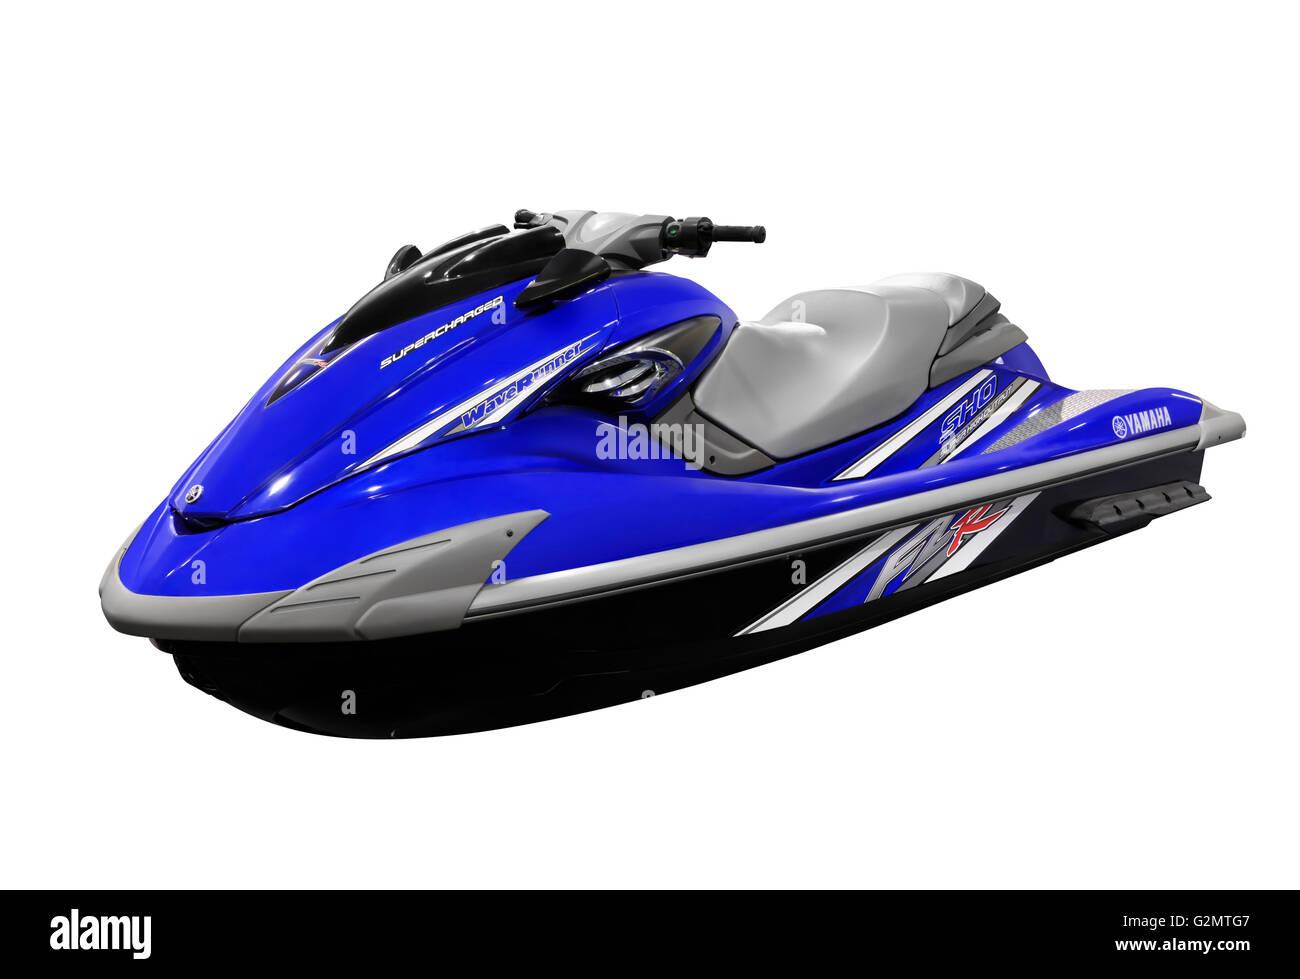 Yamaha jet ski supercharged the image for Yamaha jet skis